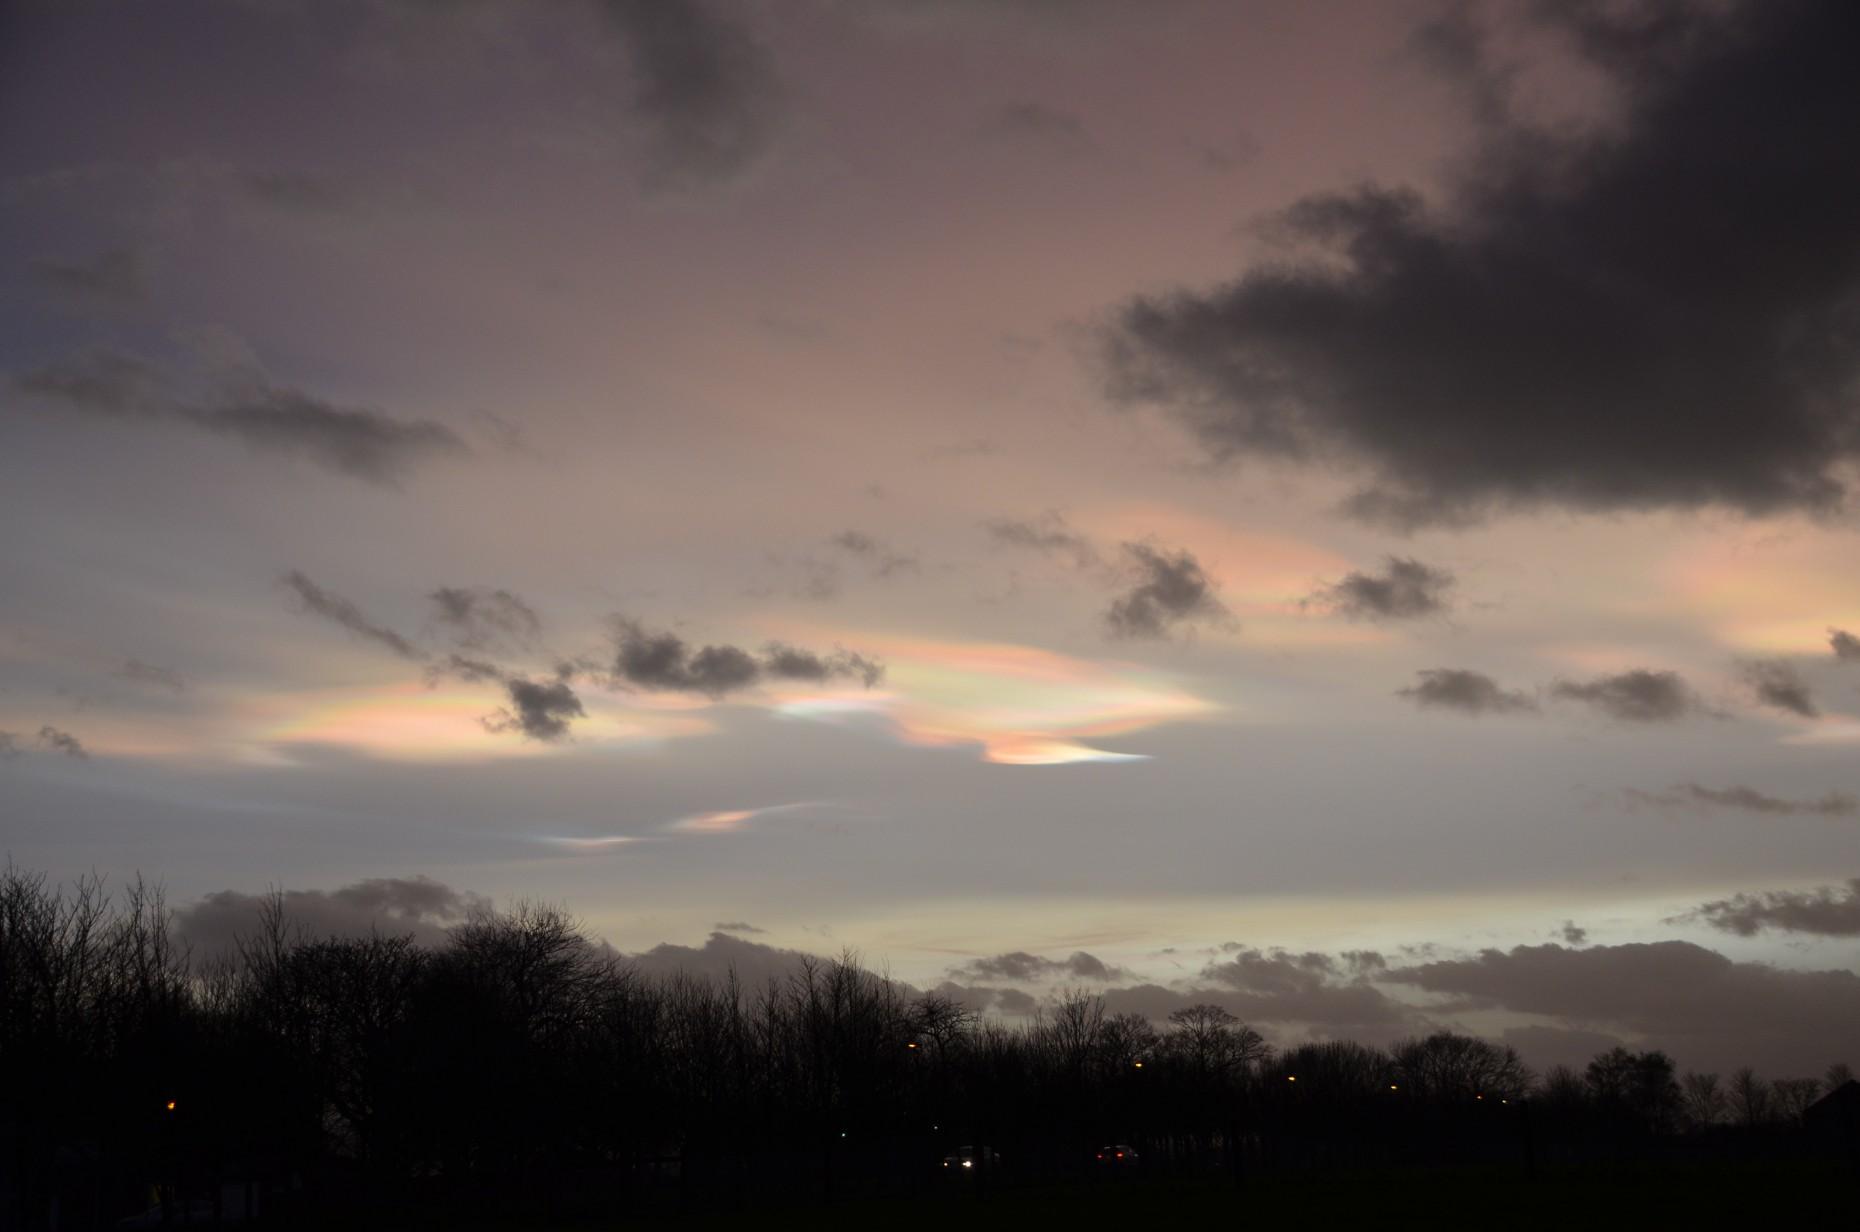 Taken over RAF Cranwell. Photo: Flisher Photography